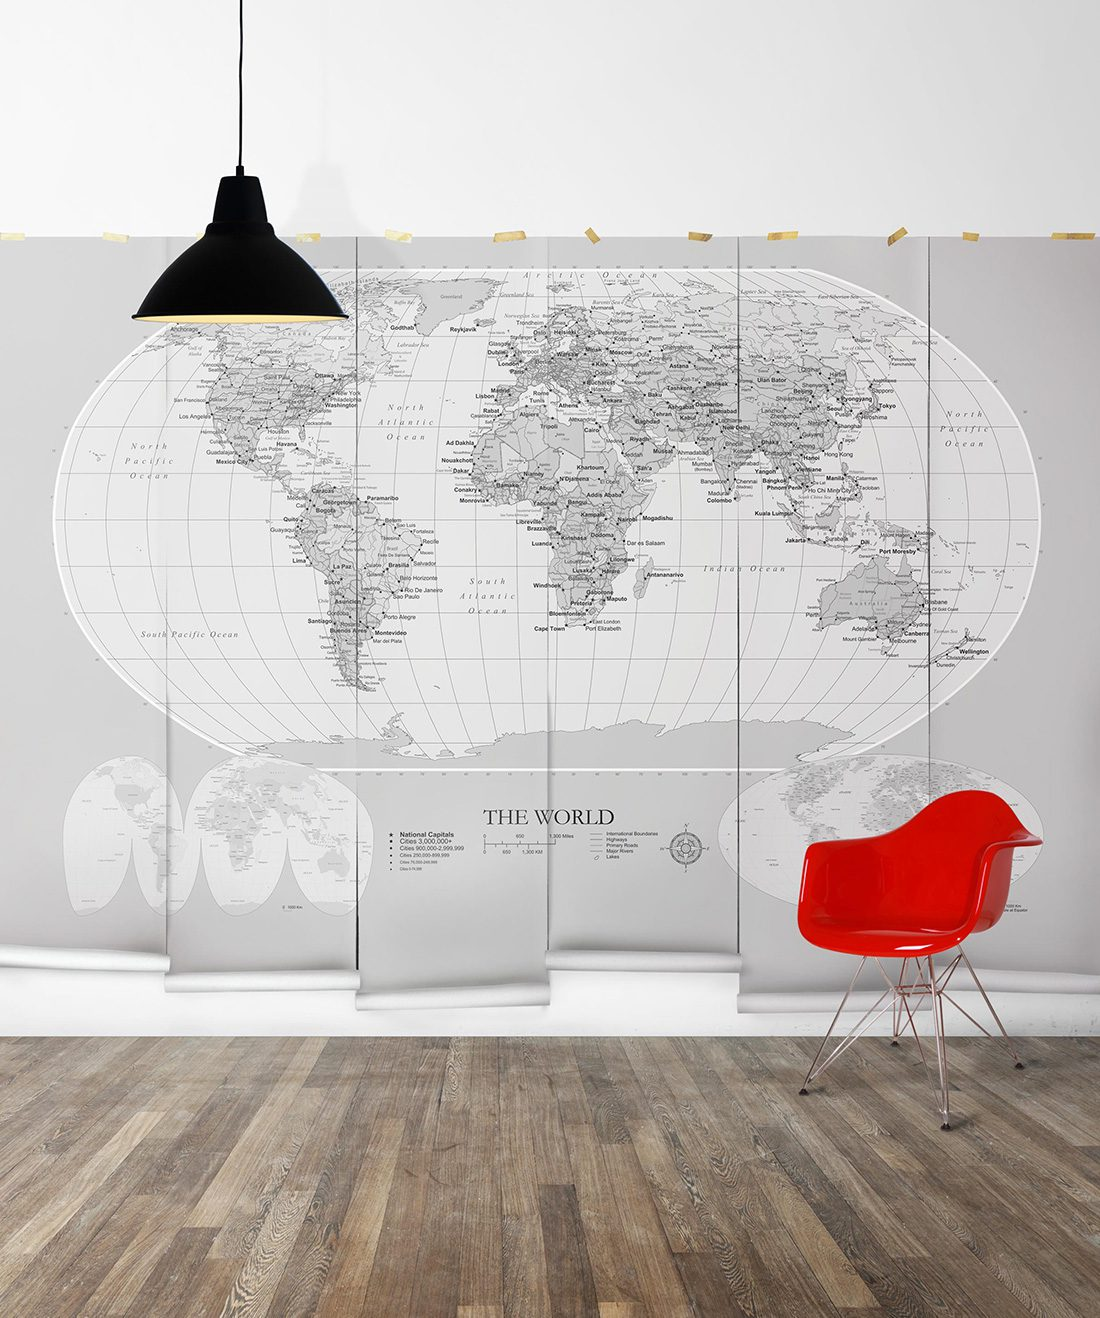 world map mural wallpaper, m\u0026m murals milton \u0026 kingworld map mural grey